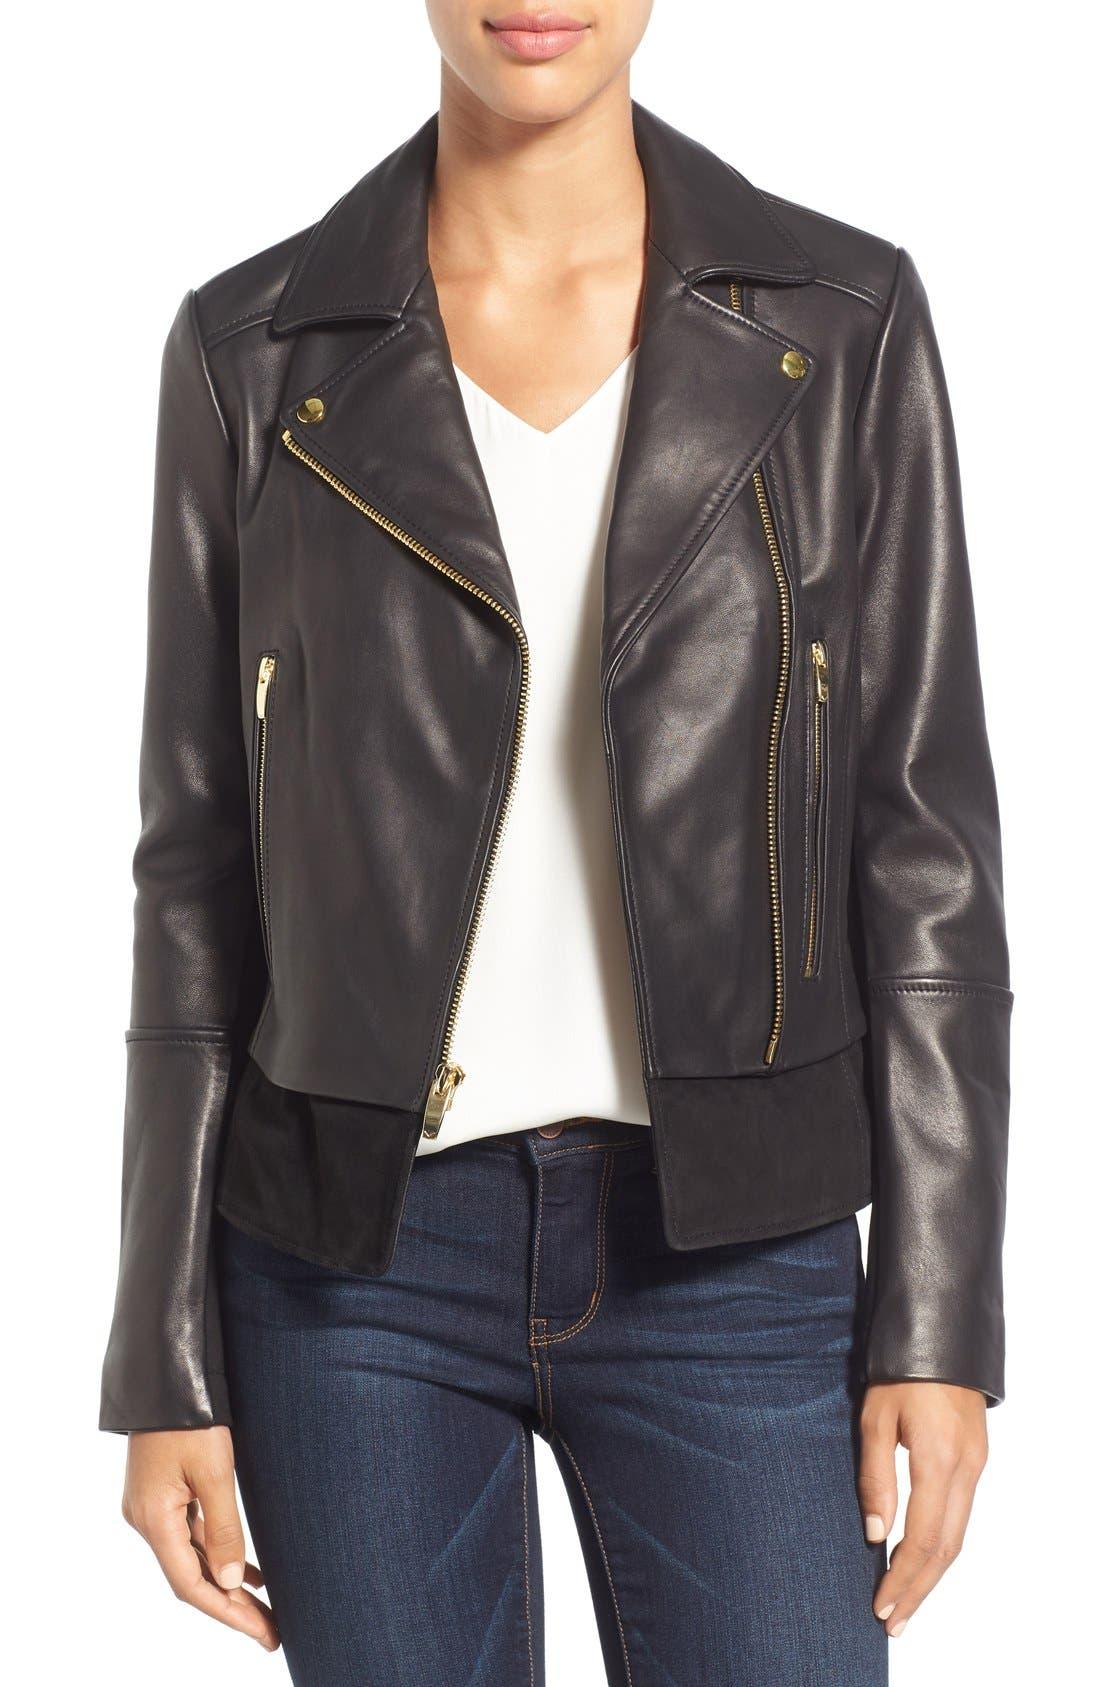 Alternate Image 1 Selected - Via Spiga Mixed Media Leather Moto Jacket (Regular & Petite)